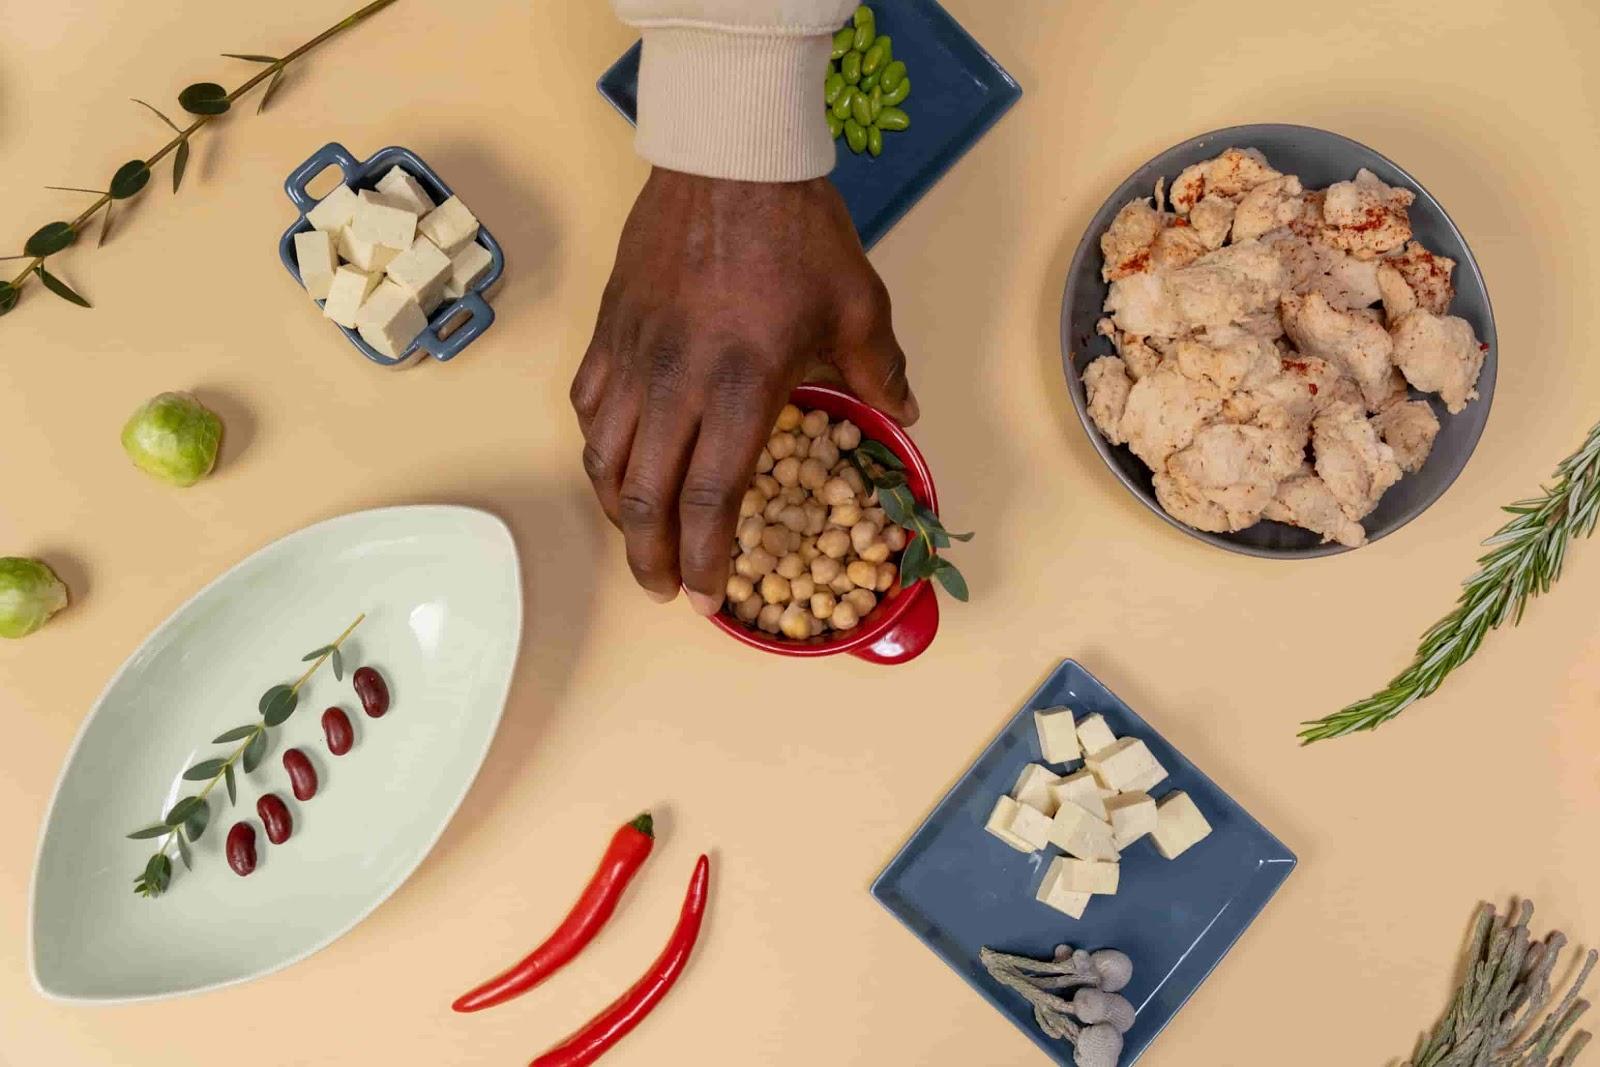 pratos com ingredientes veganos